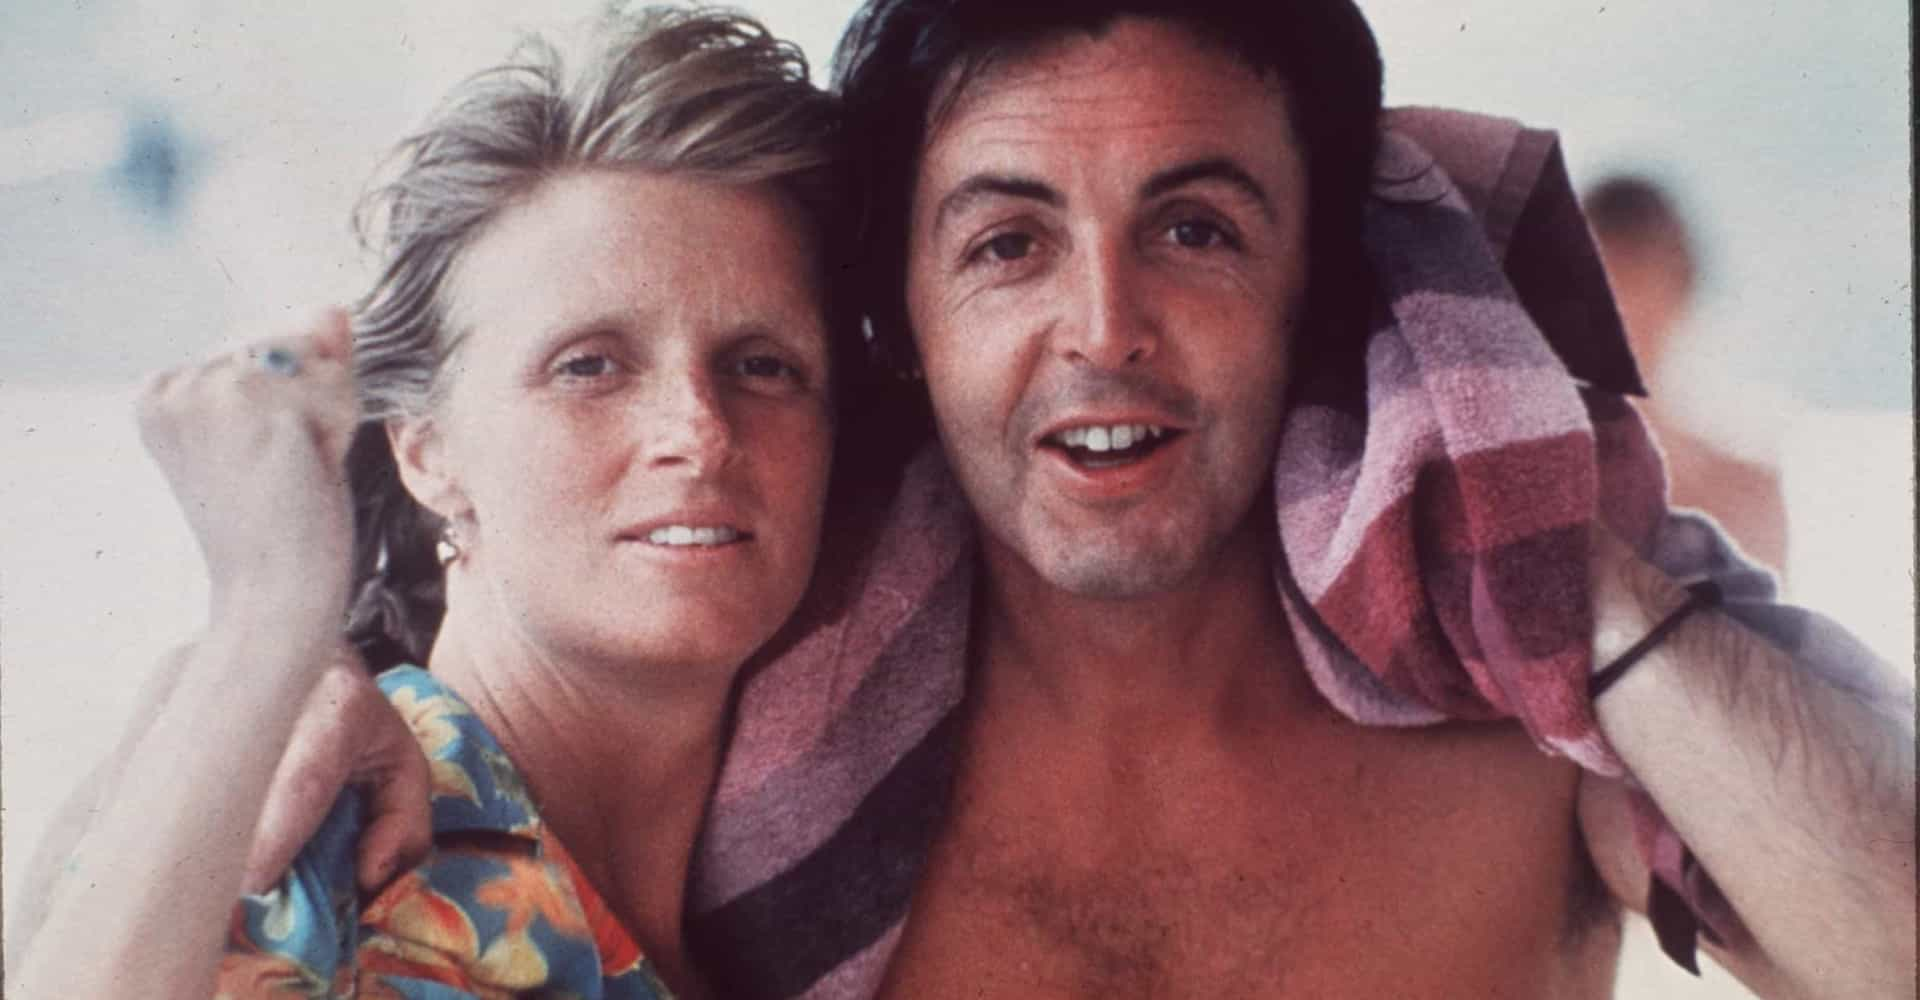 Fascinating photos of Linda and Paul McCartney